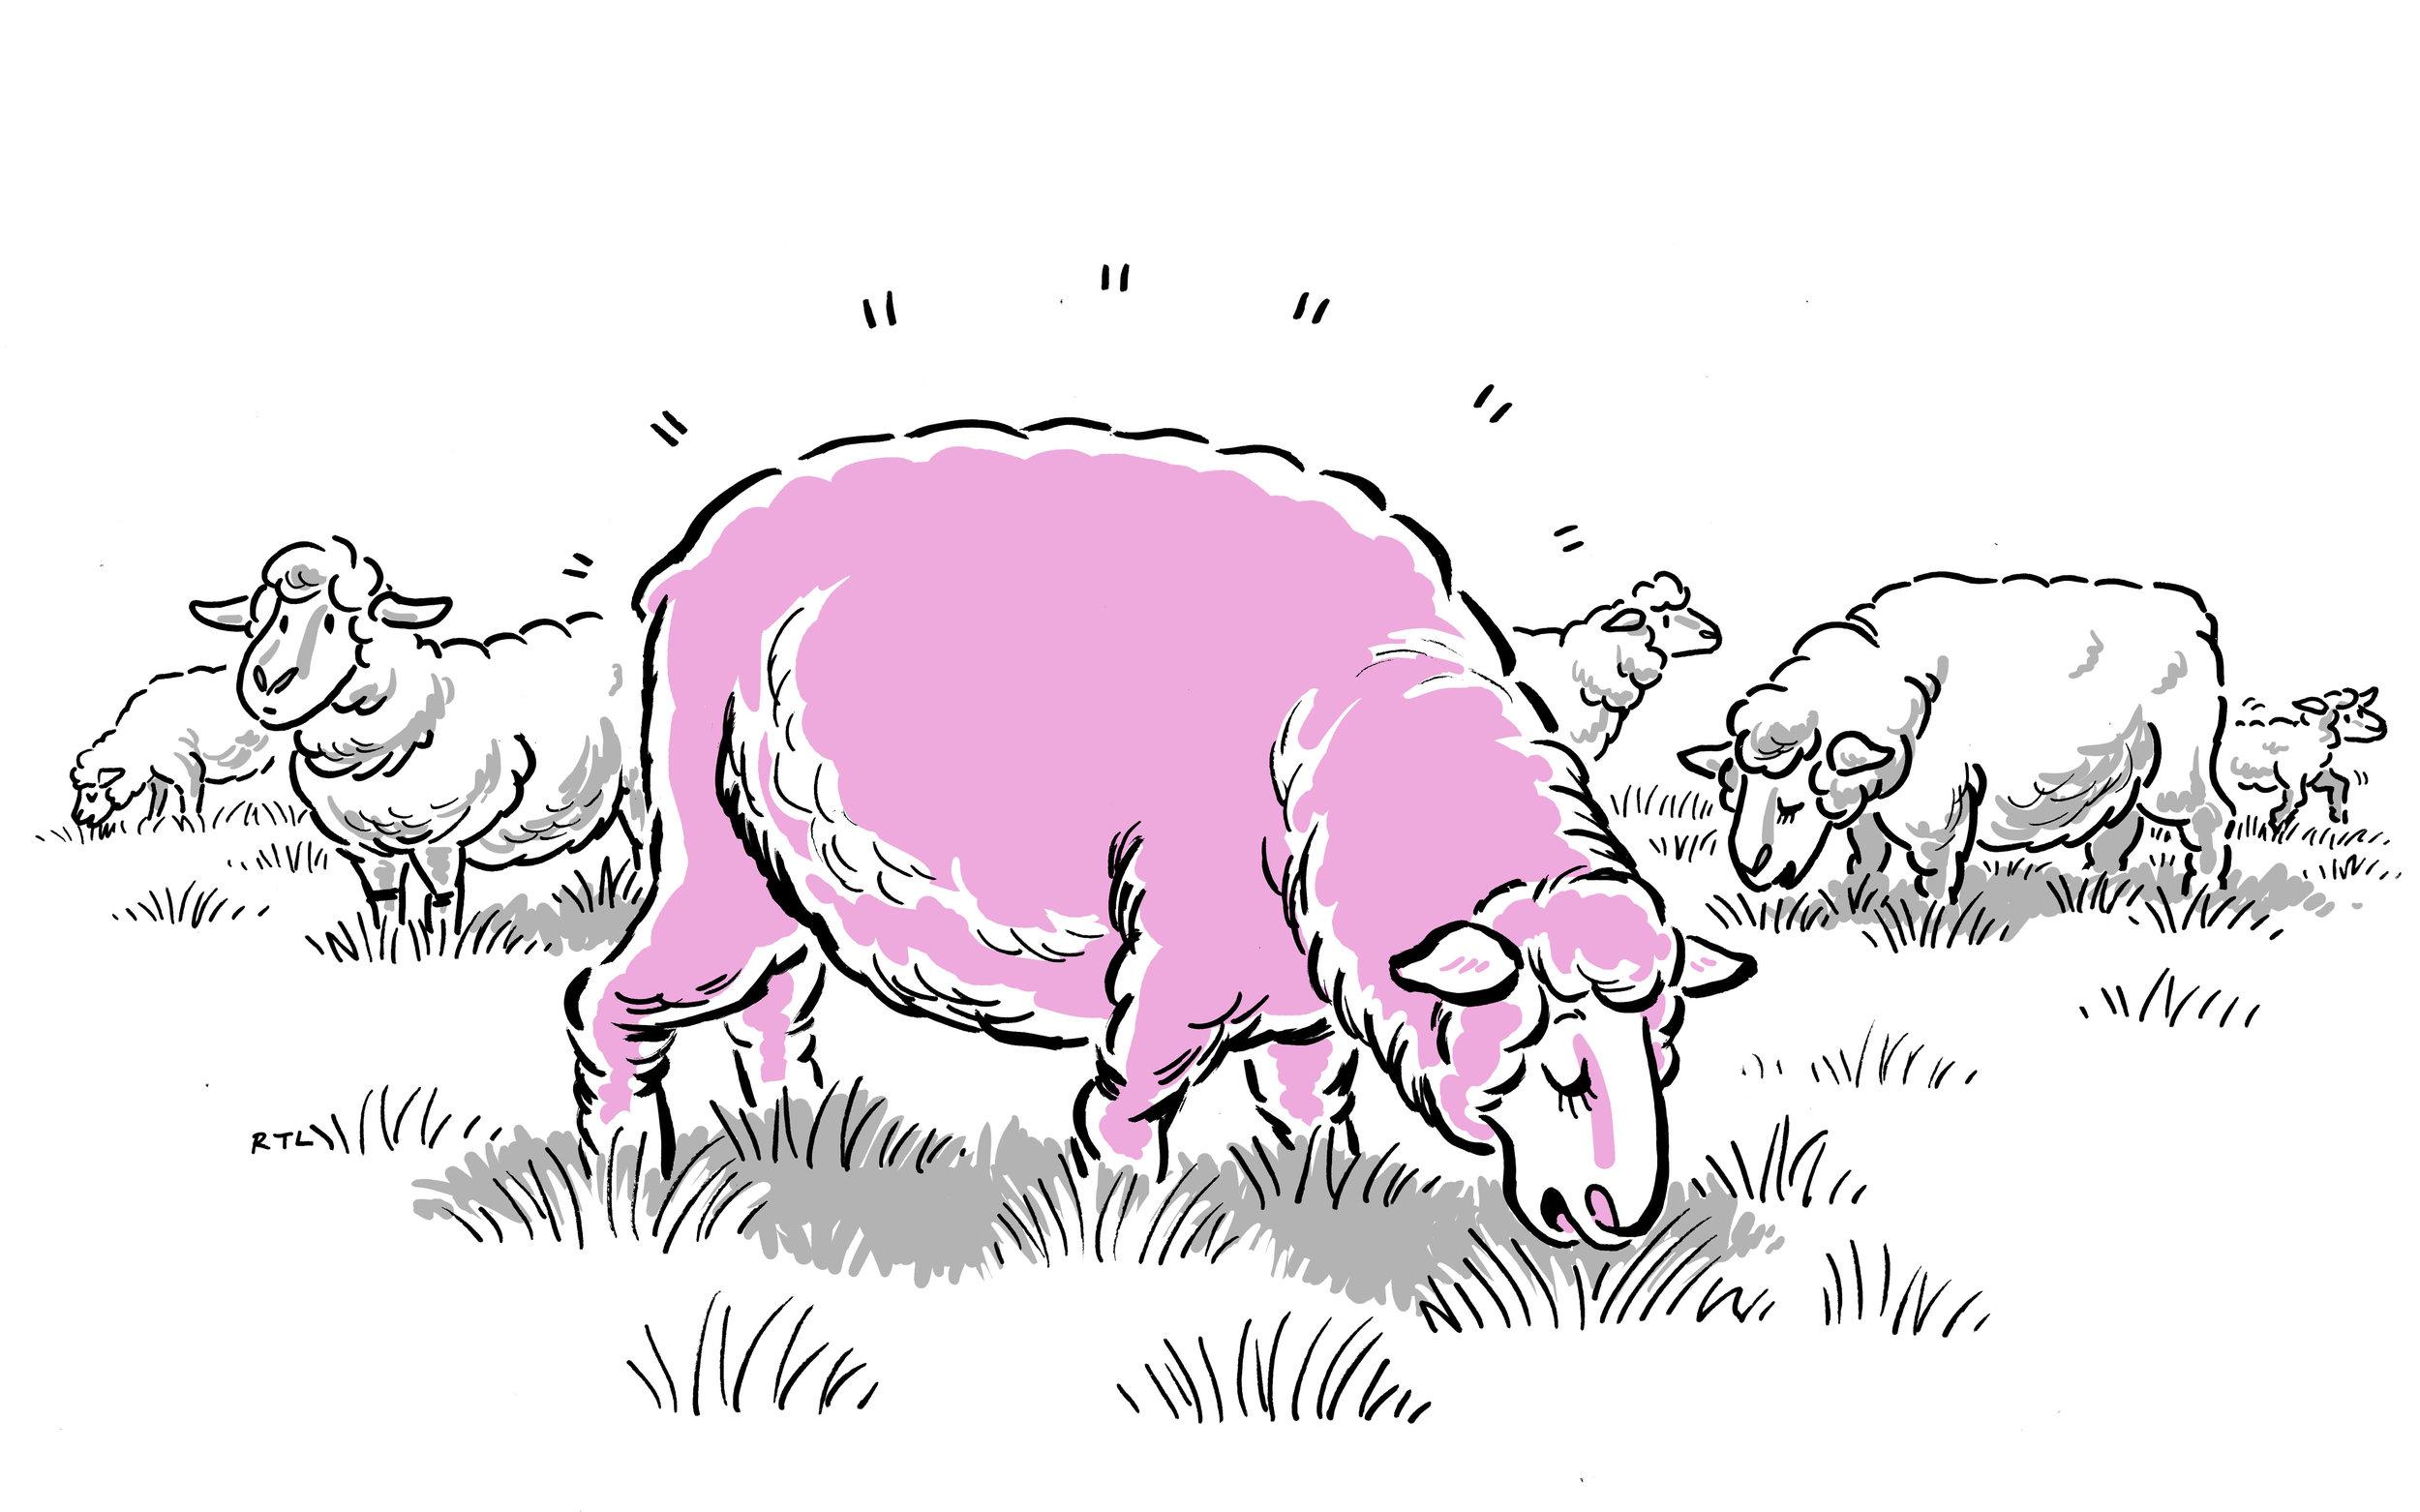 cartoon-07_BW_A1.jpg